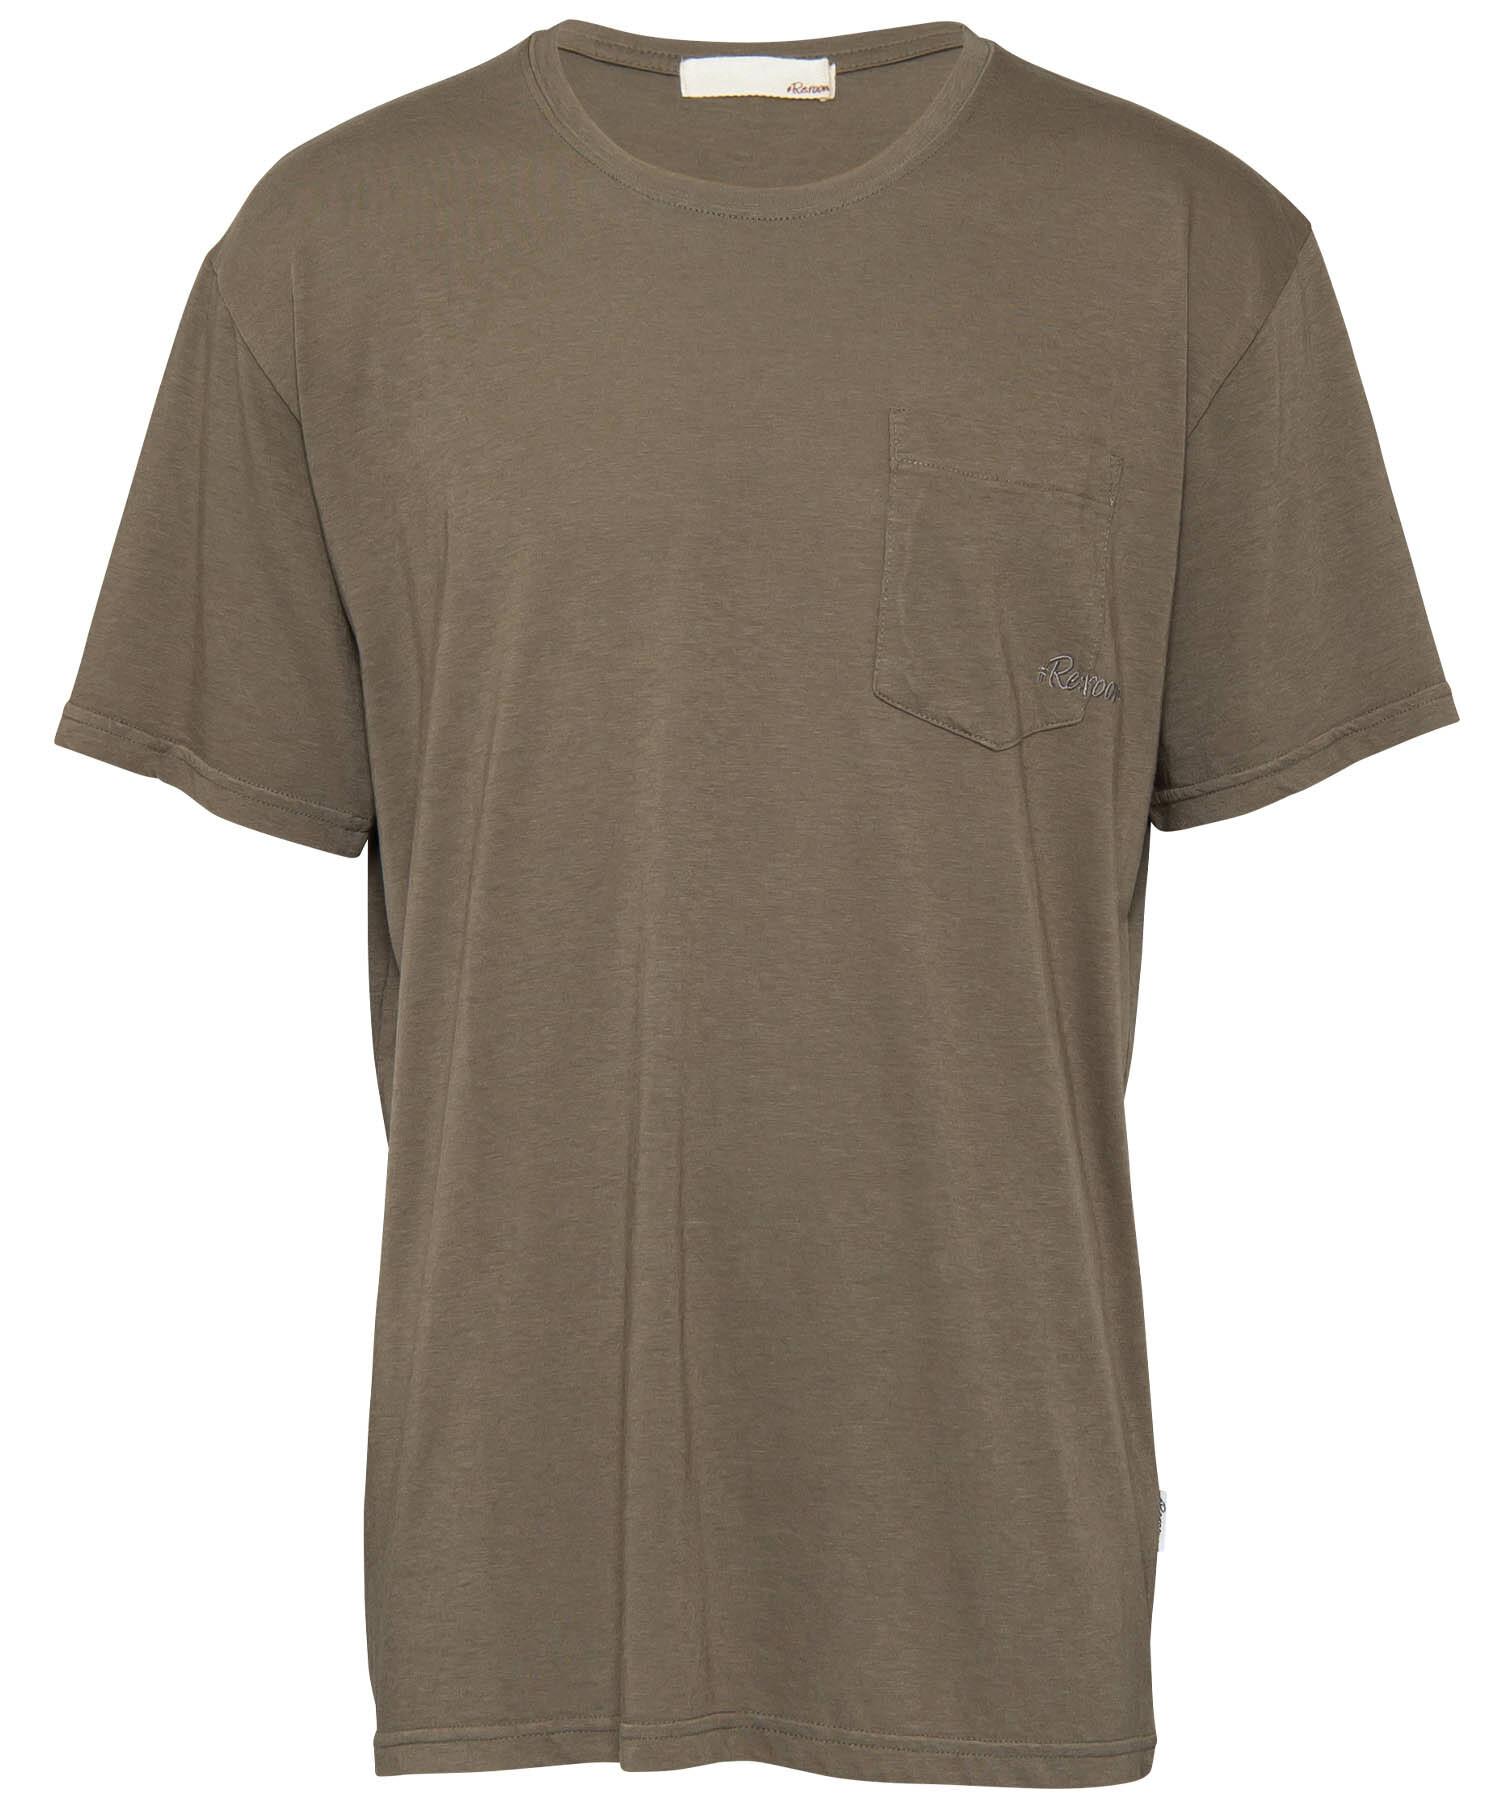 EMBROIDERY LOGO POCKET T-shirt[REC298]